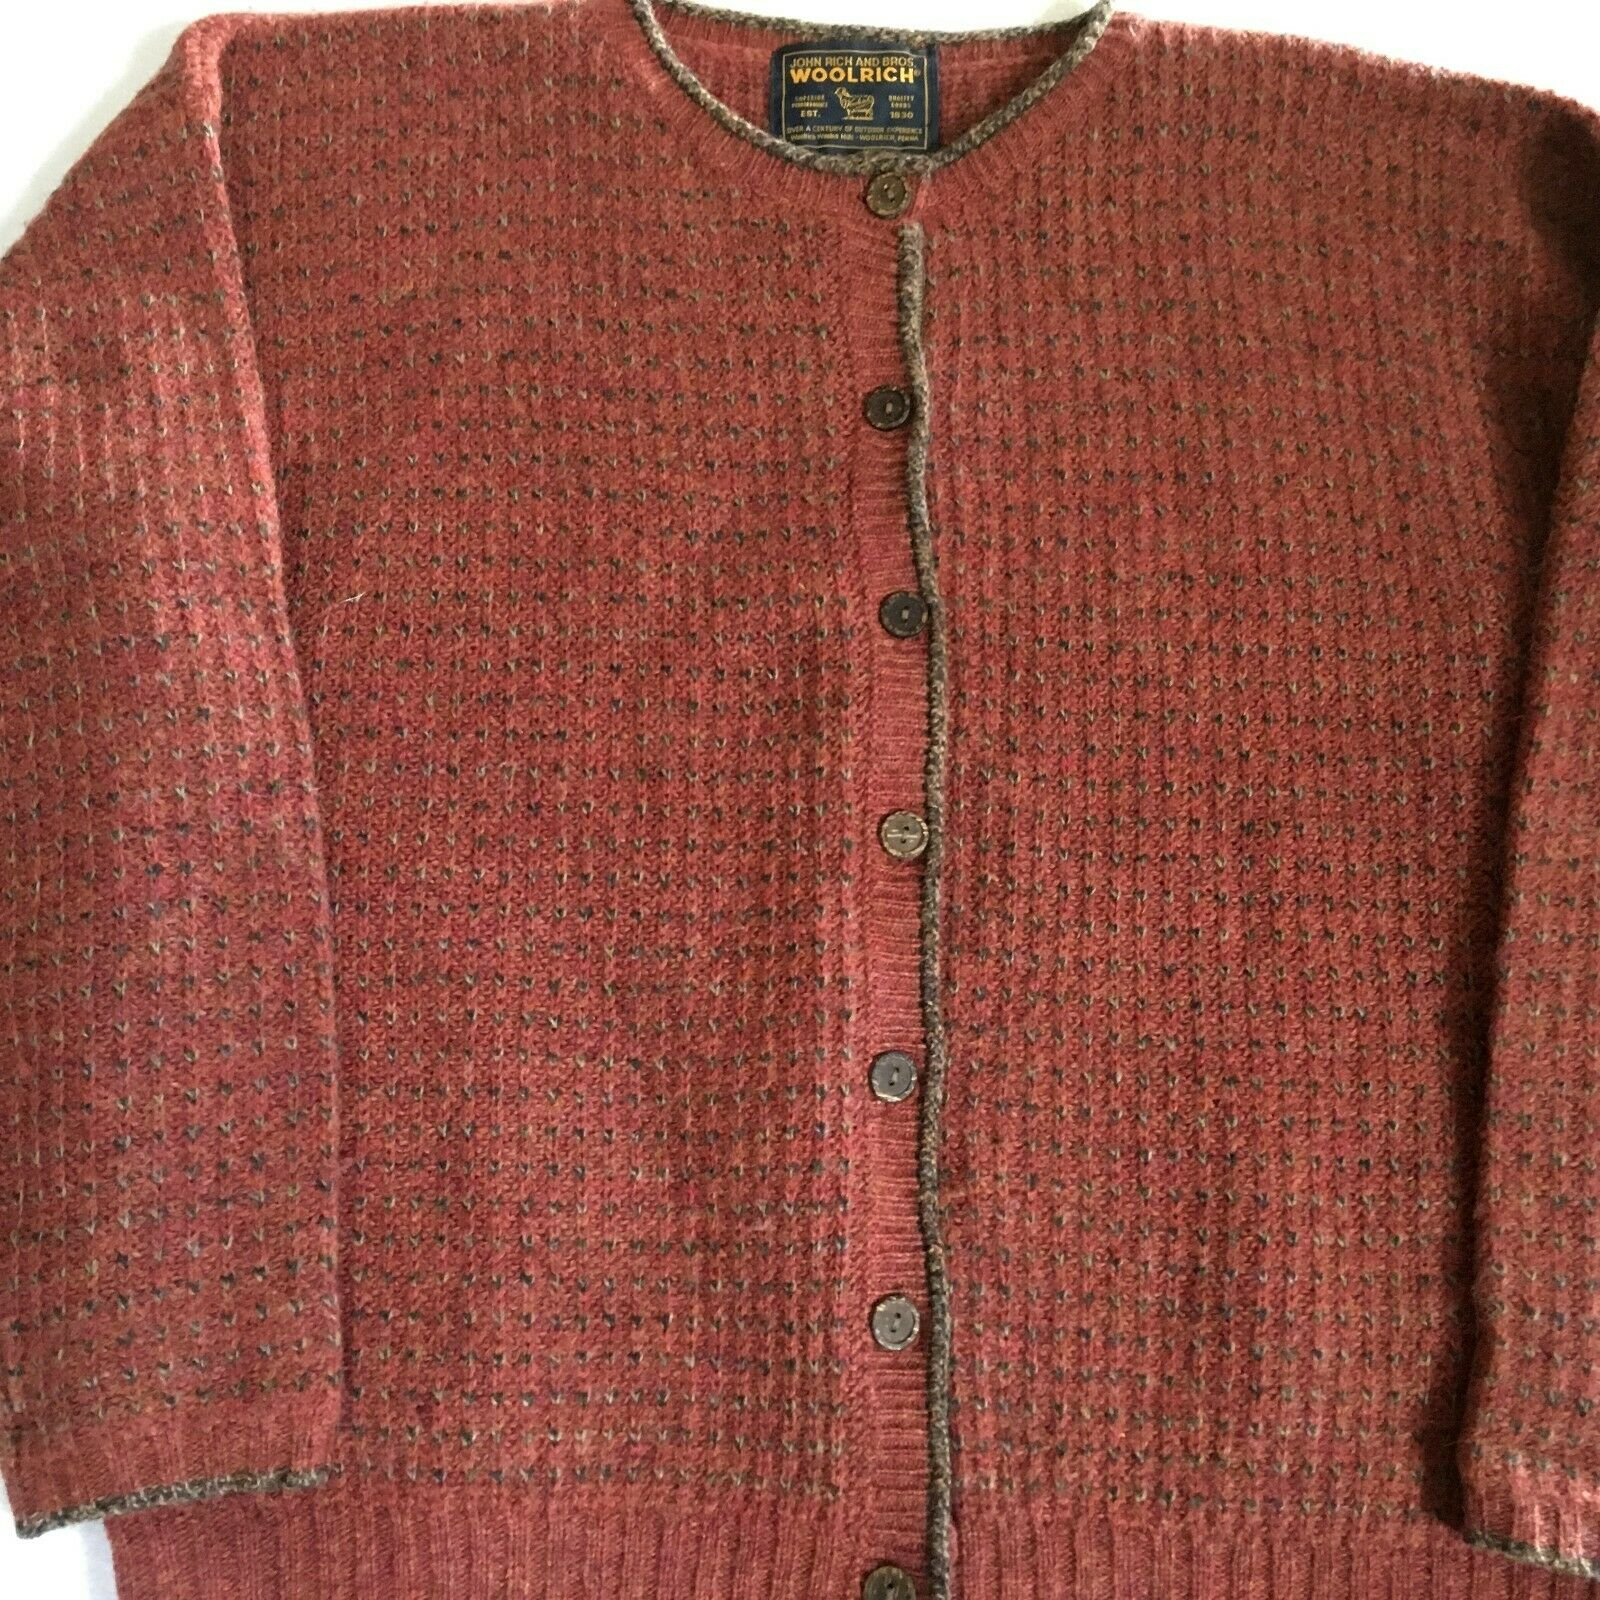 Woolrich John Rich Bros Sweater Wool Cardigan Nor… - image 1